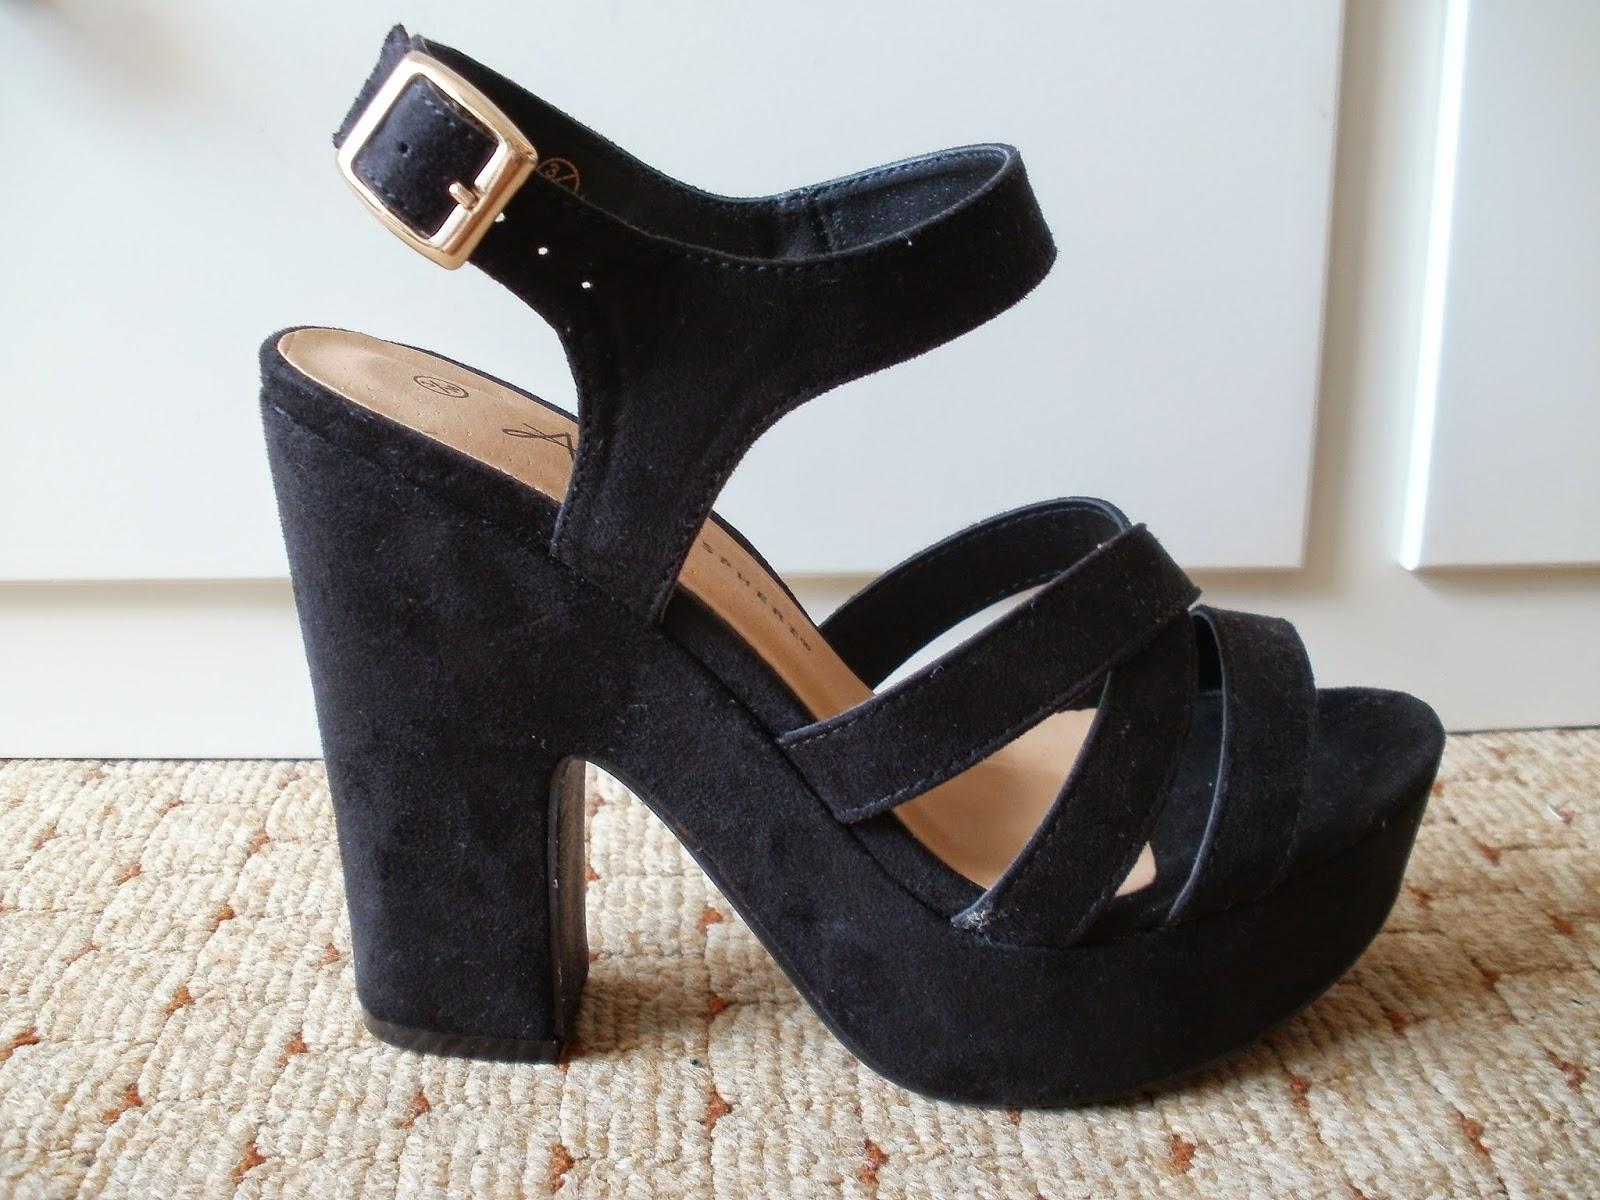 696220d37ff Porcelain Eleanor: Shoes on a Shoestring # Primark Strappy Toe ...